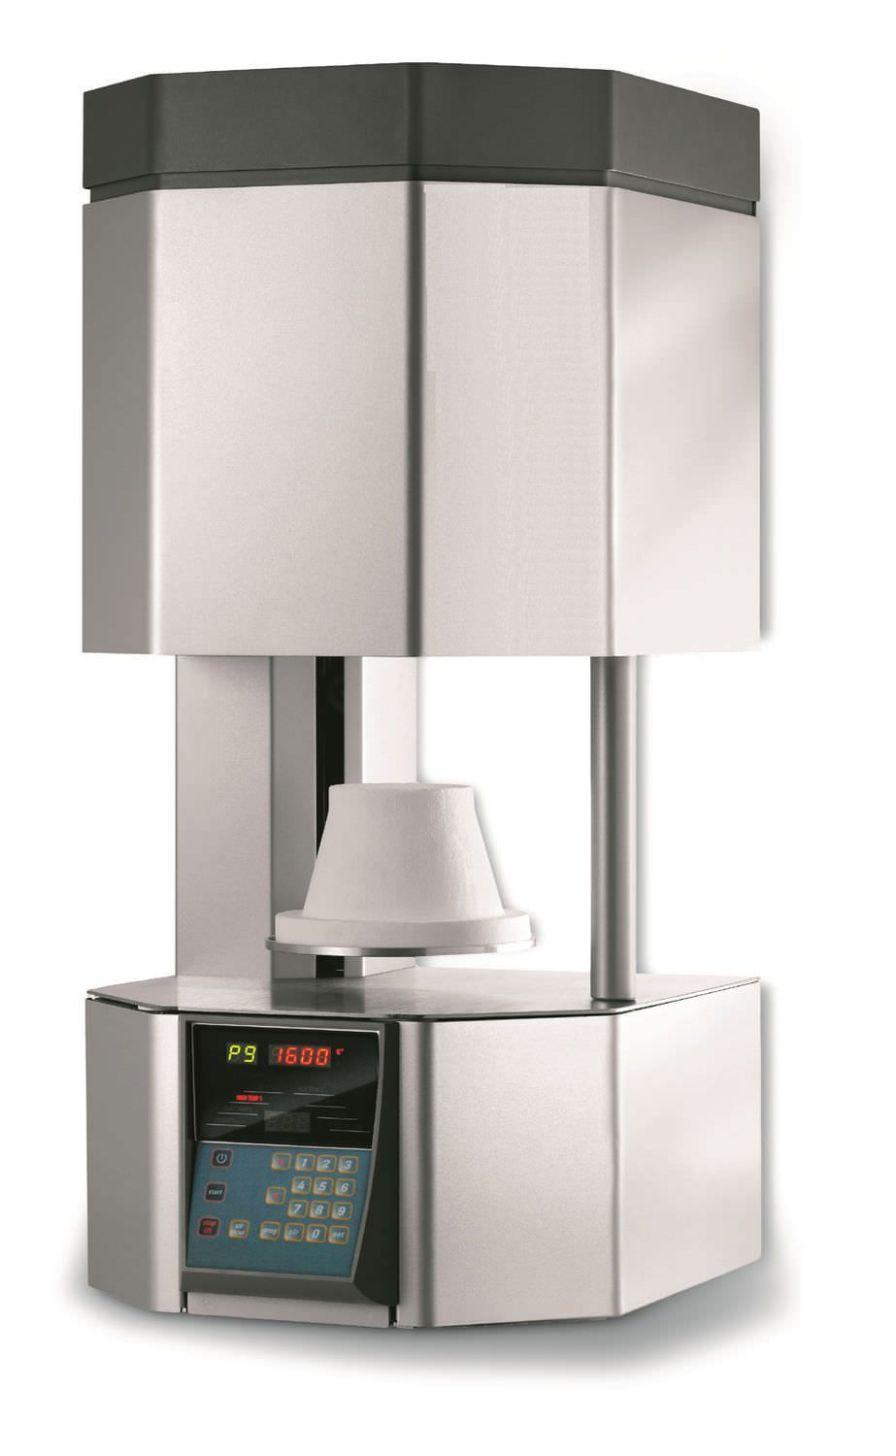 Sintering furnace / dental laboratory / zirconia 1650°C | LD-Sinter 165 Laserdentium